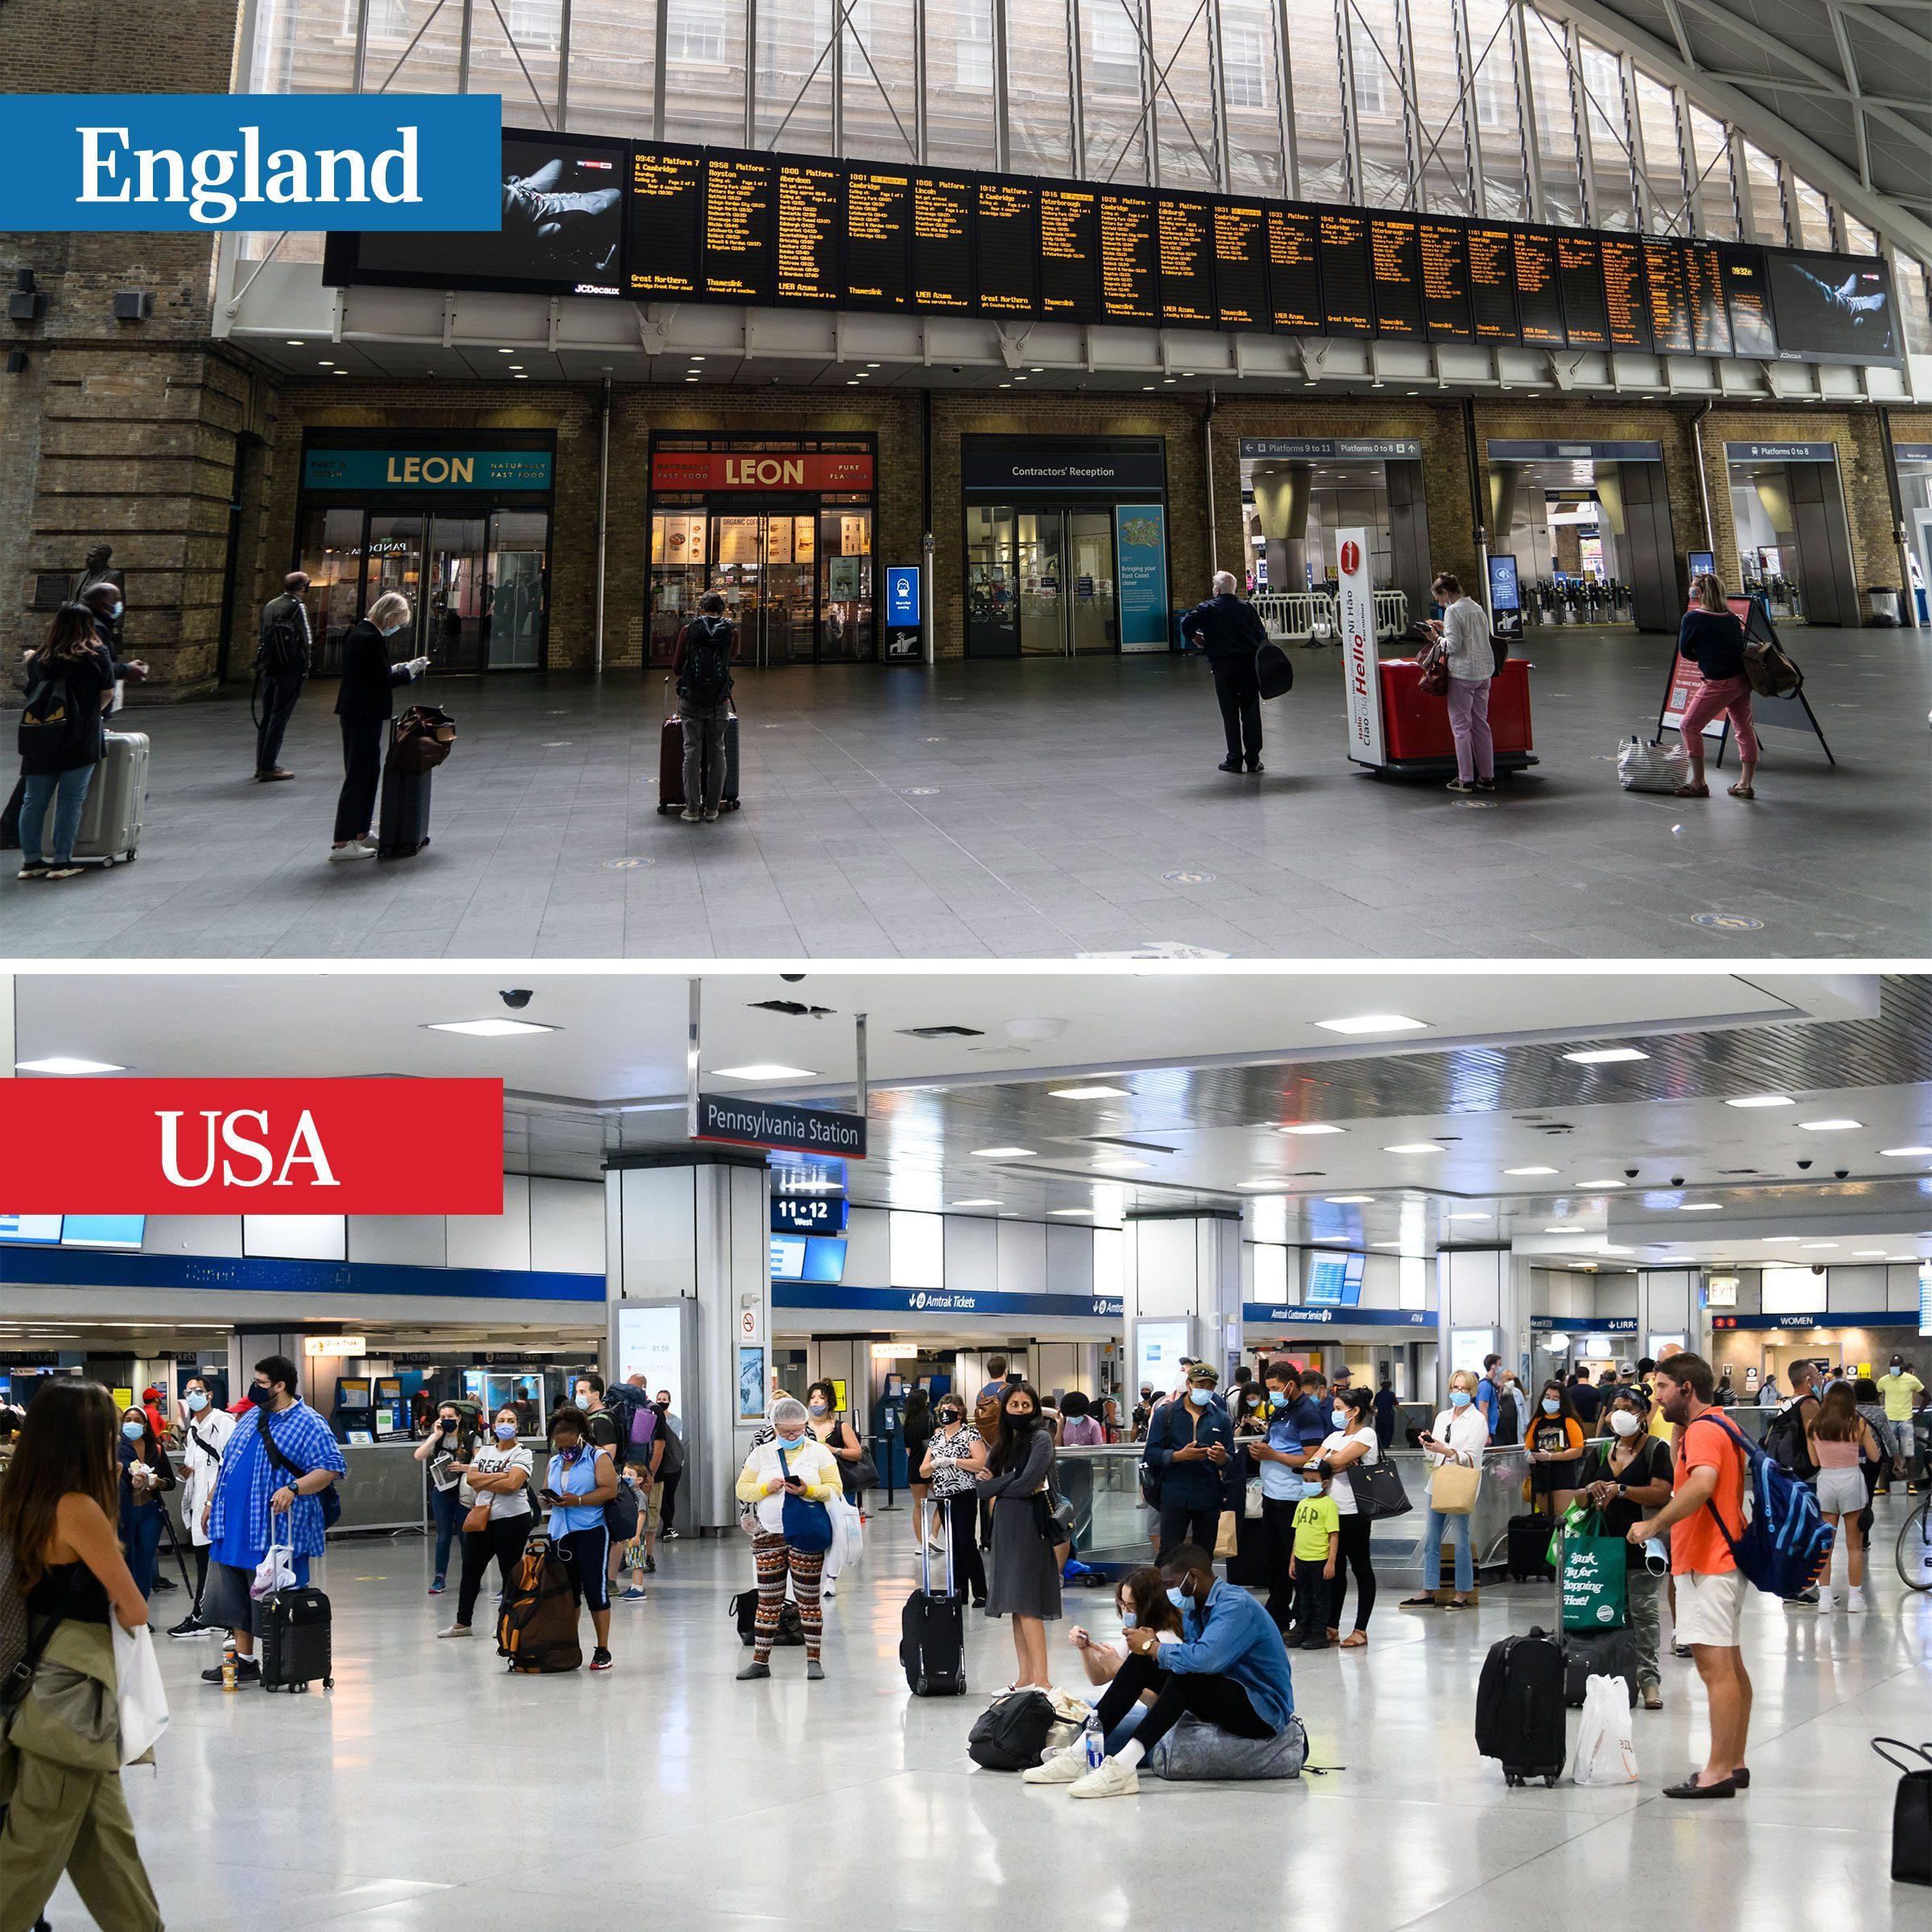 england vs usa - train travel